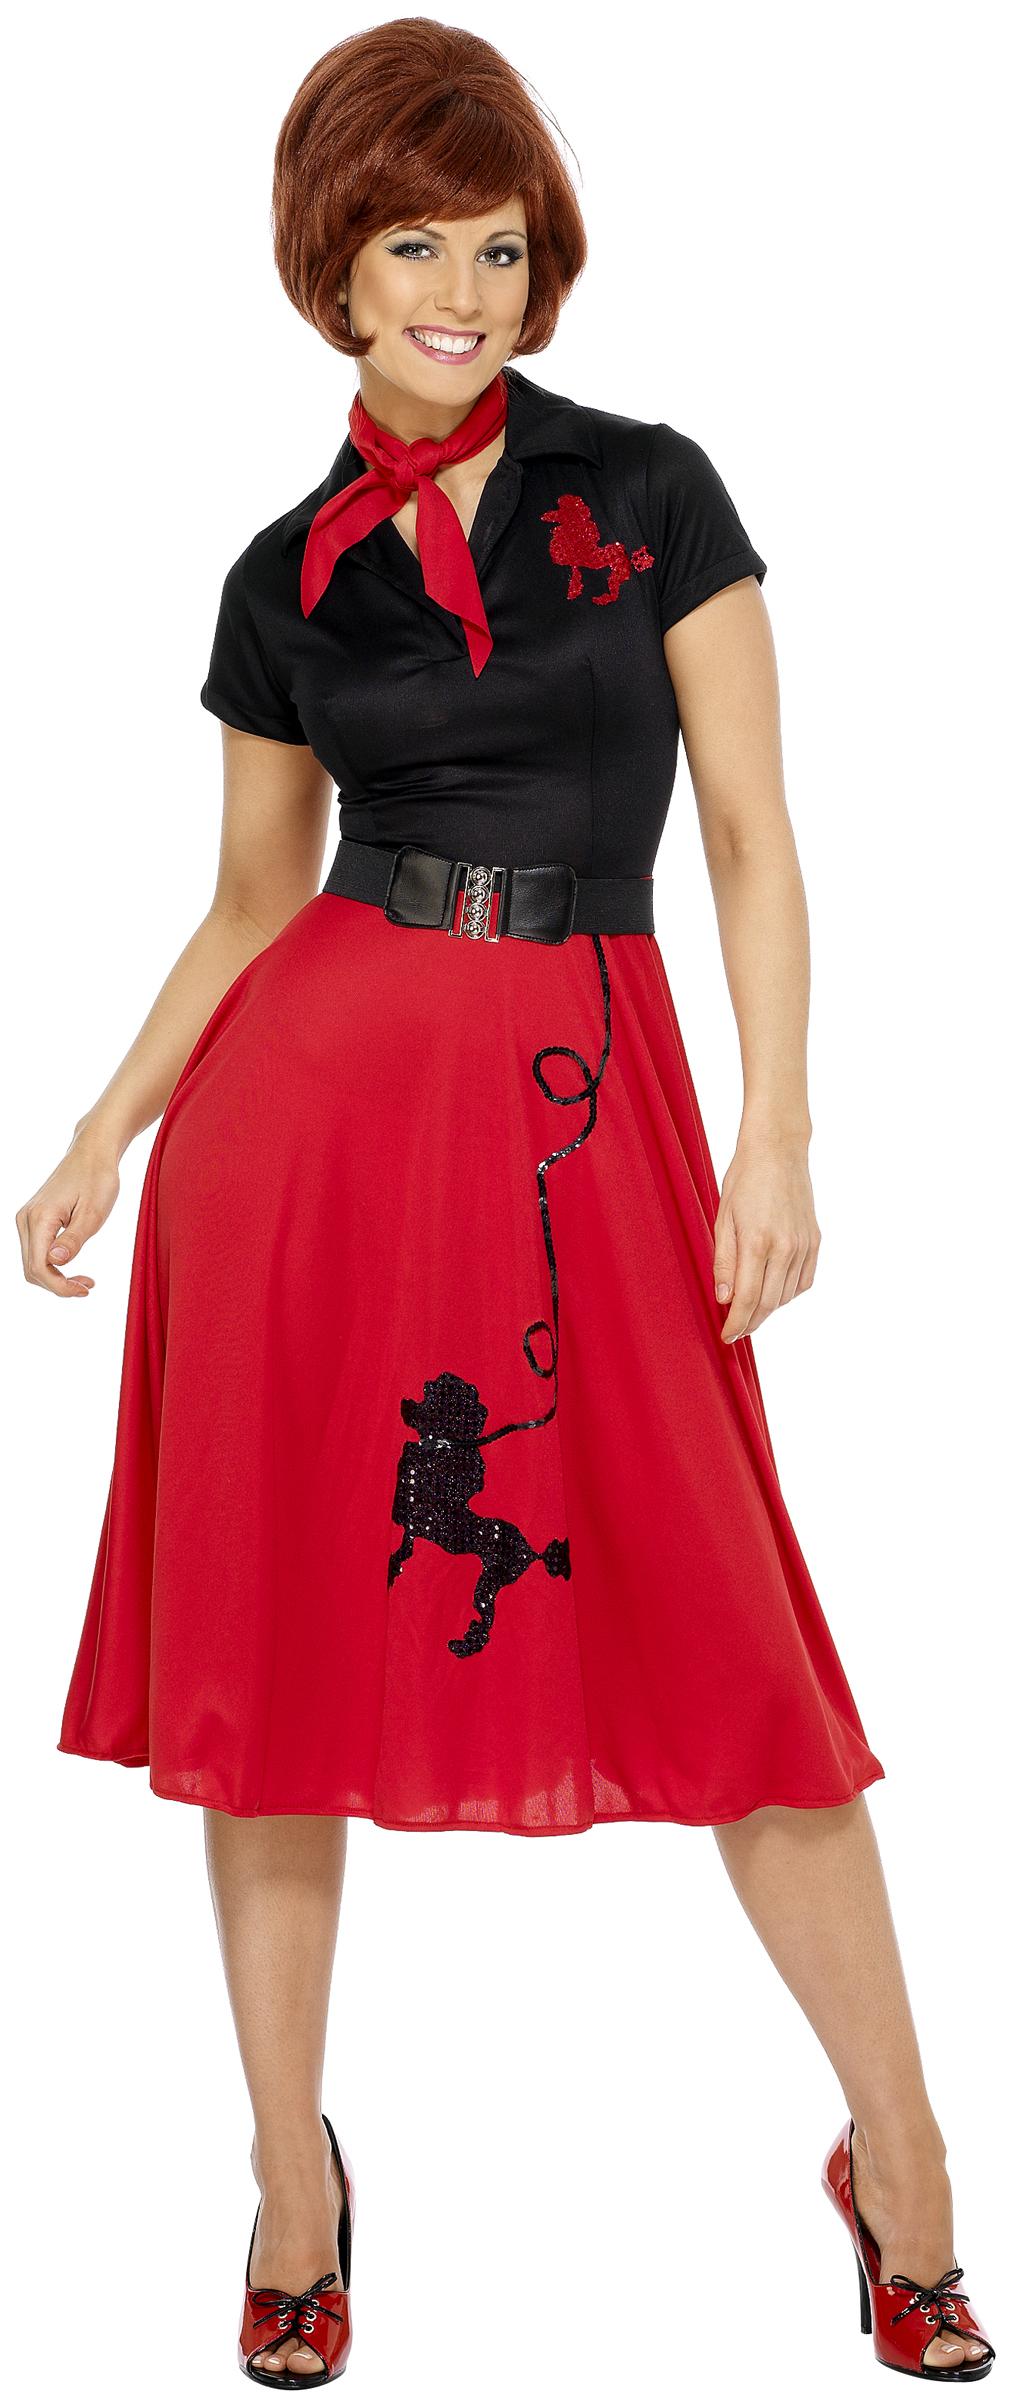 d guisement rock n 39 roll ann es 50 costume twist femme. Black Bedroom Furniture Sets. Home Design Ideas